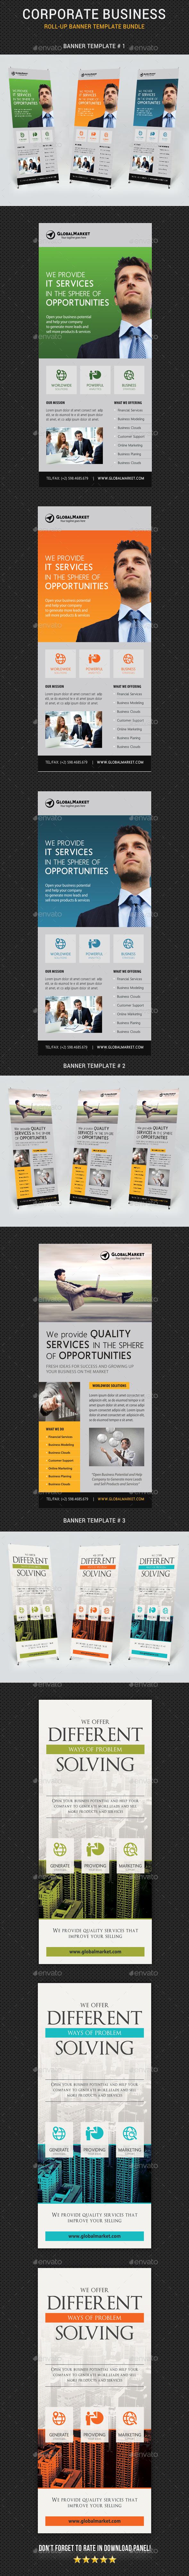 Corporate Business Banner Bundle - Signage Print Templates